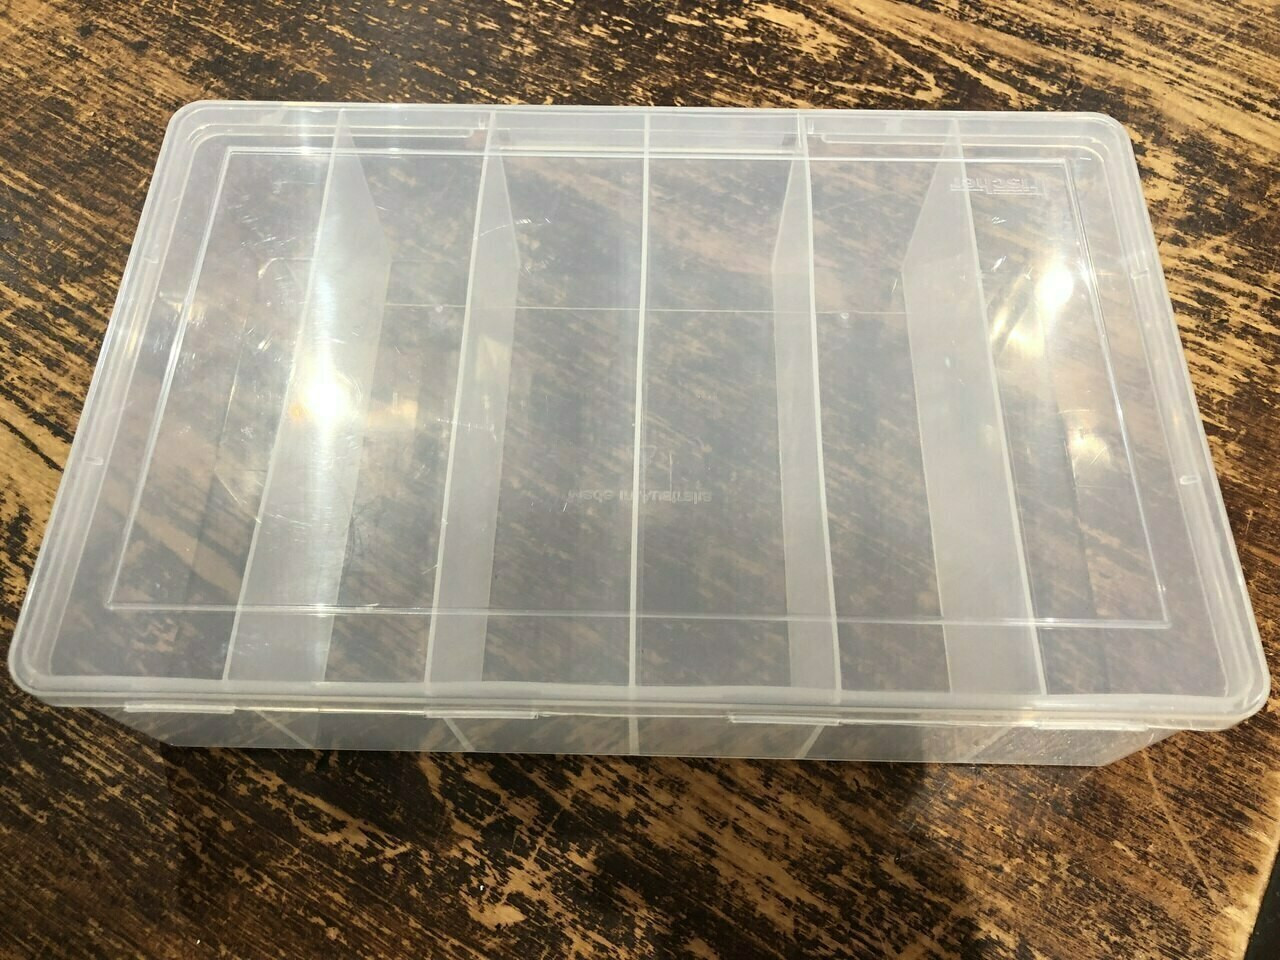 Aurifil Empty Large Spool Thread Box